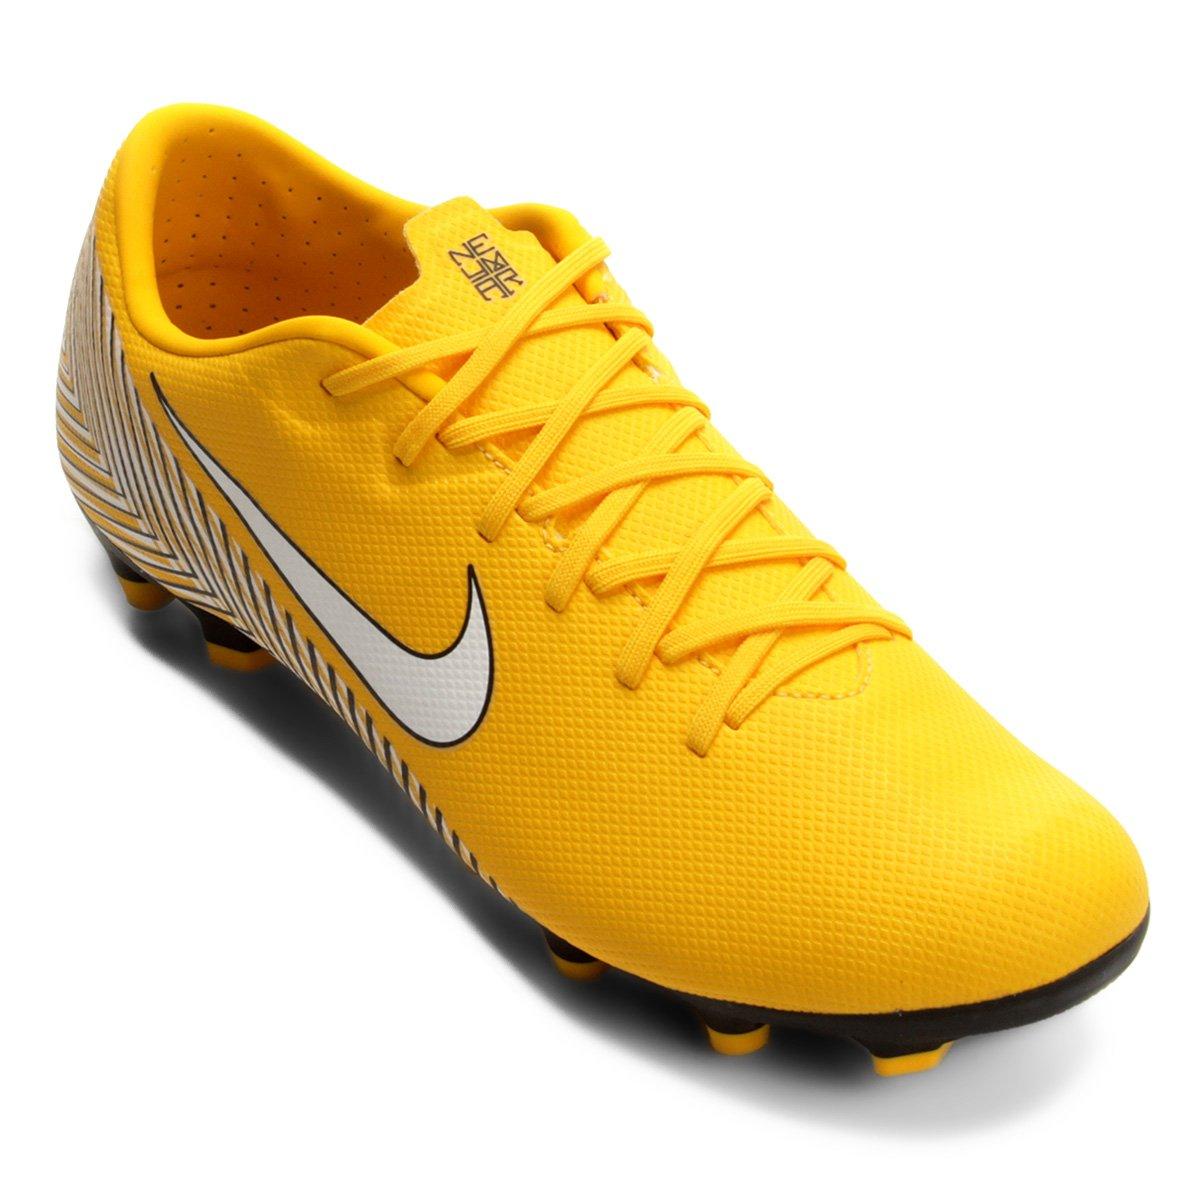 5b15b659b0 Chuteira Campo Nike Mercurial Vapor 12 Academy Neymar FG - Amarelo ...